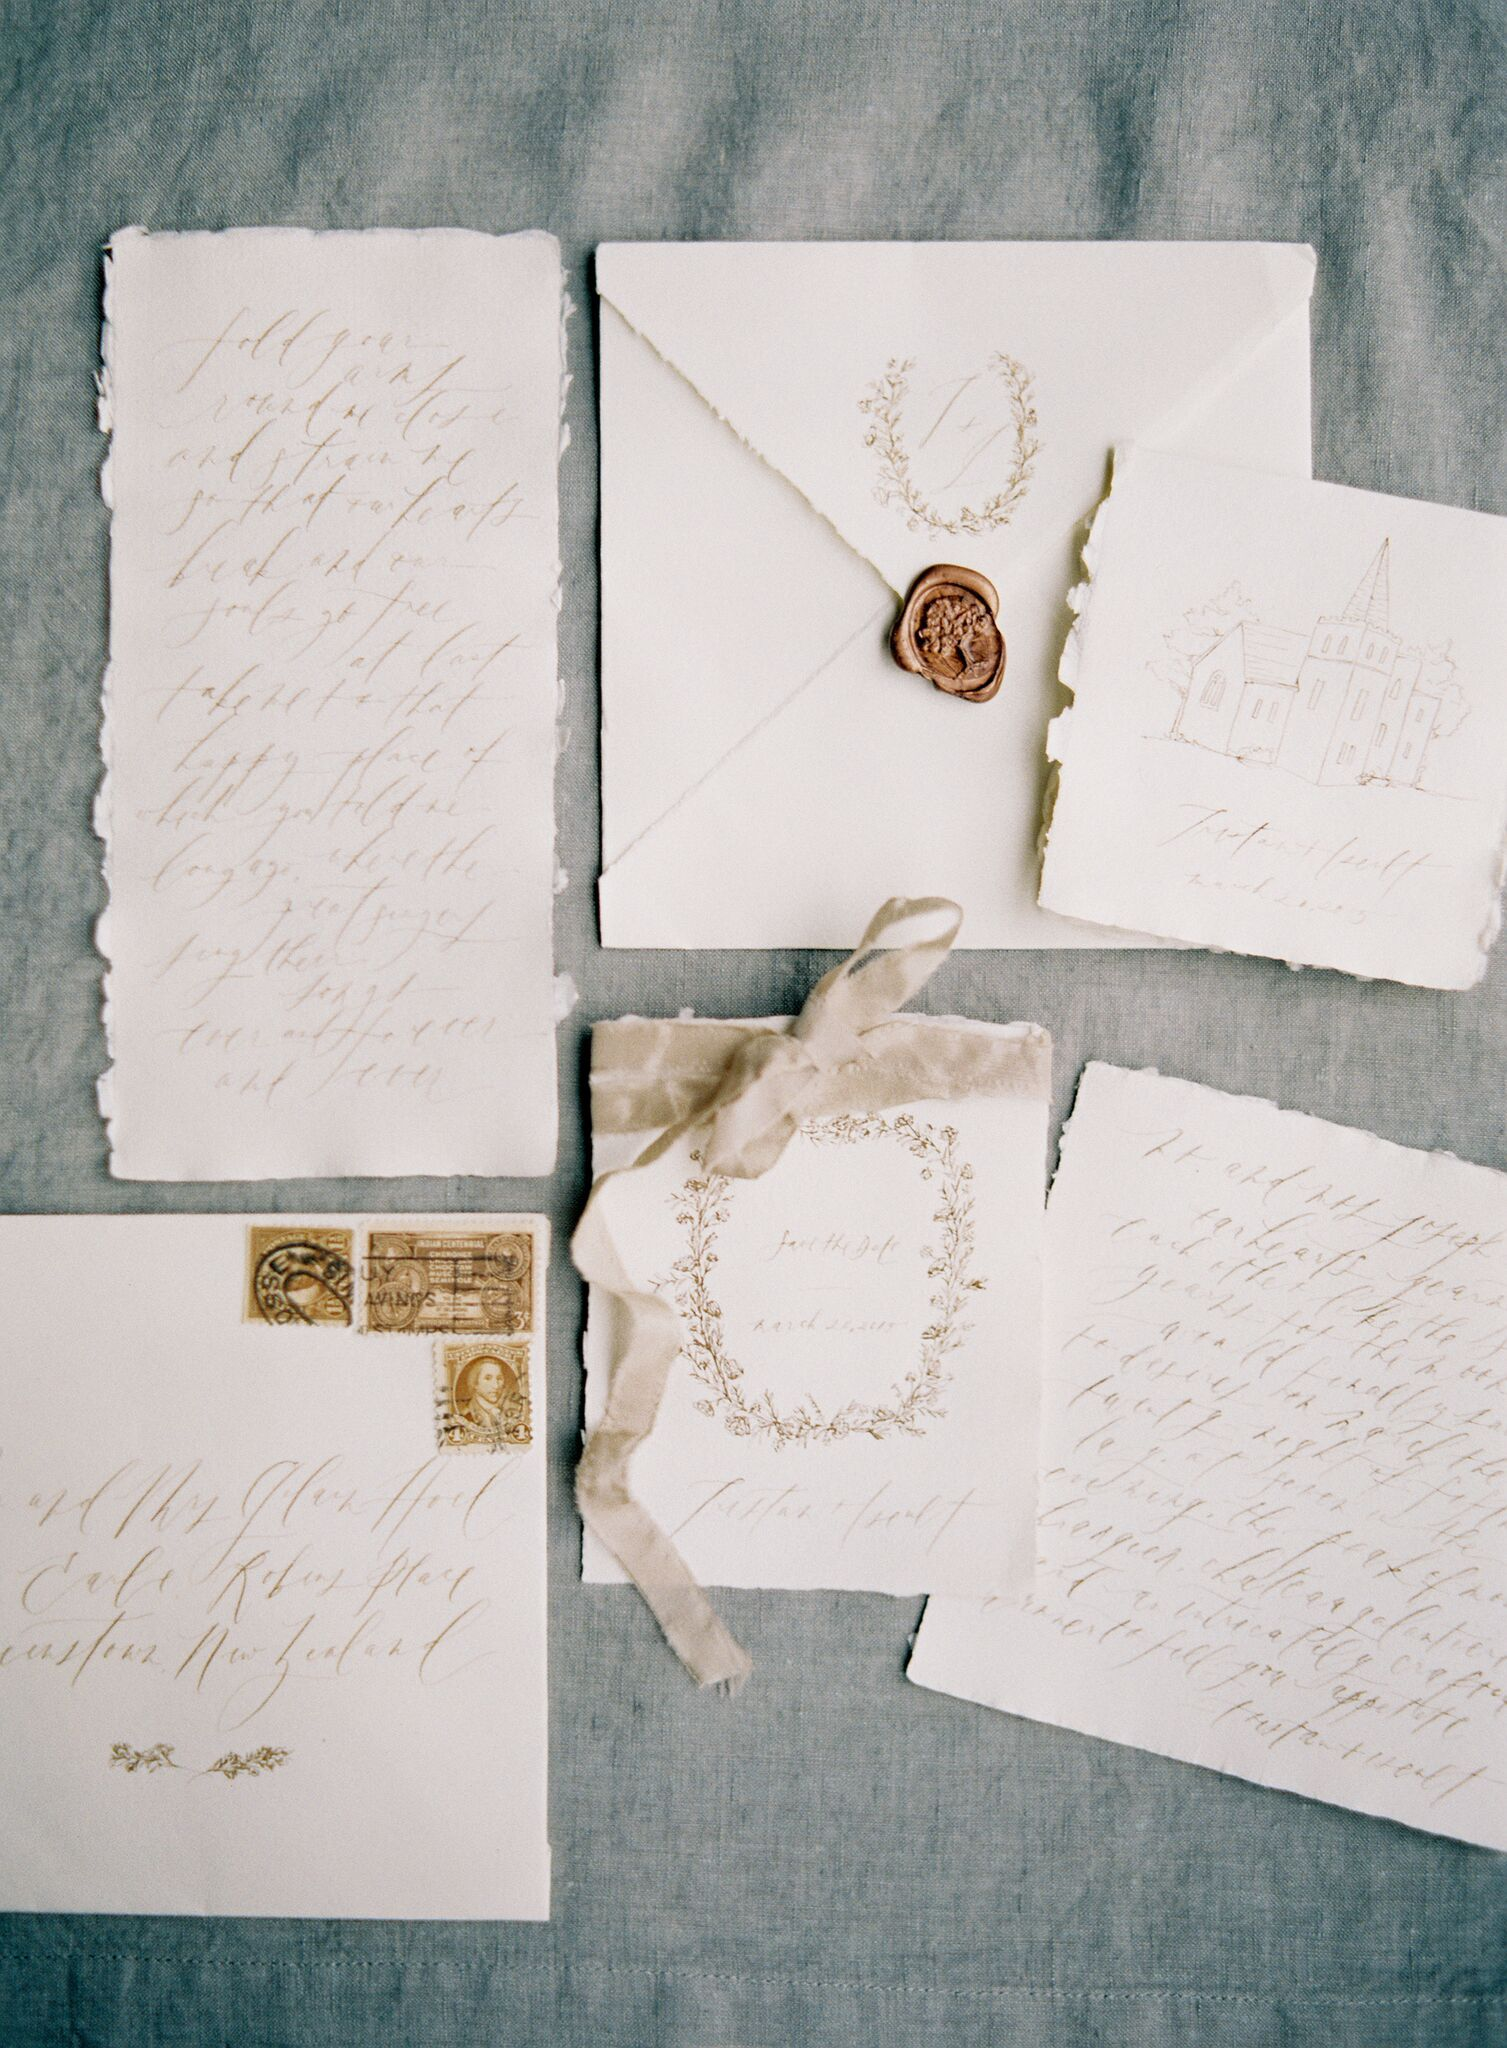 Forage and Fern workshop / handmade paper / sepia wedding ...